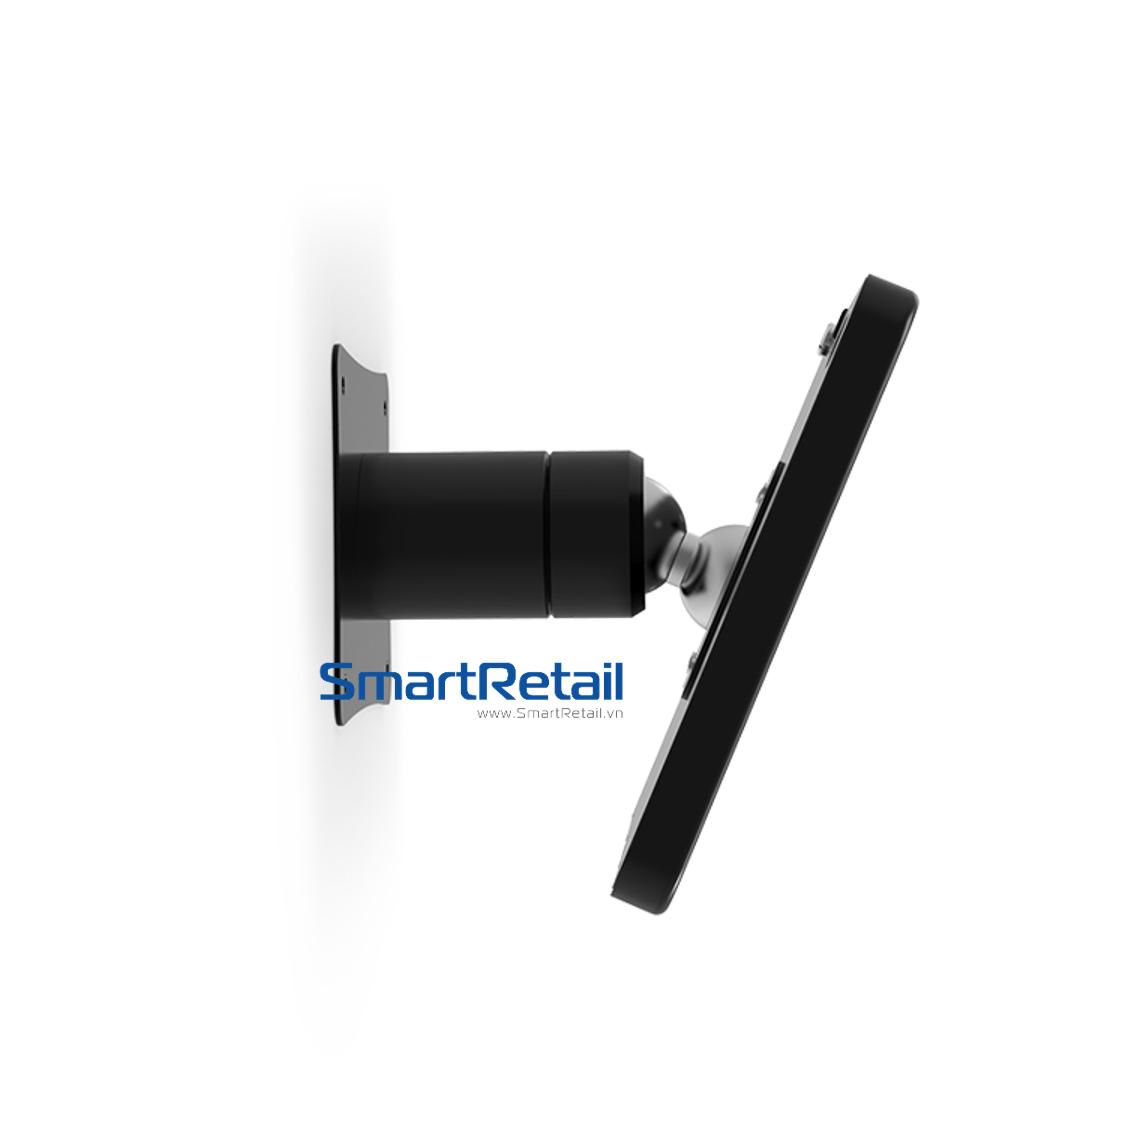 SmartRetail Thiet bi bao ve Tablet SW304 4